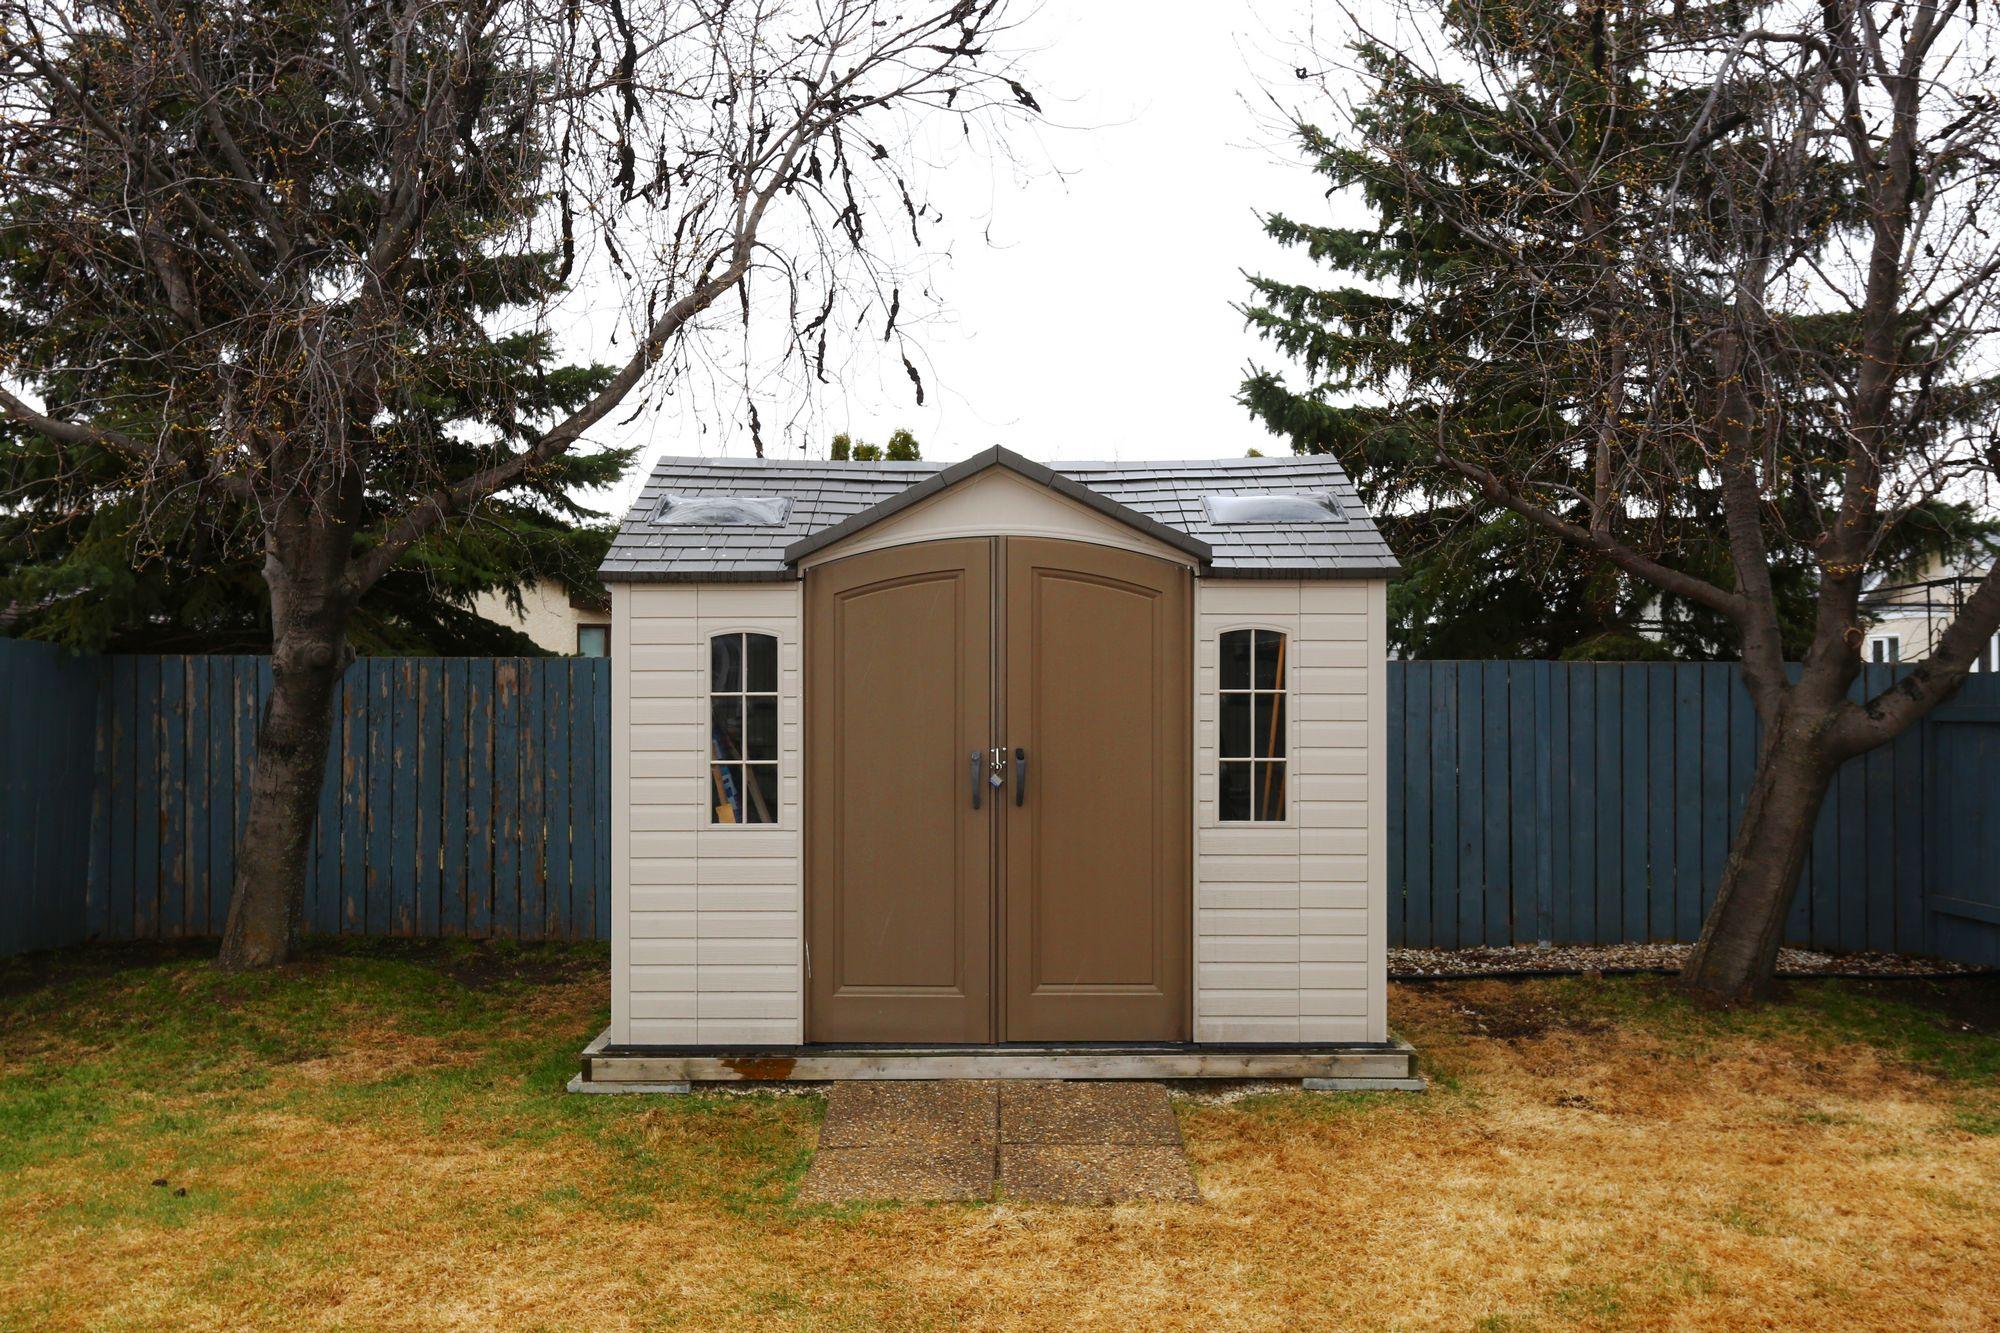 57 Chisholm Drive, Winnipeg, Manitoba  R2R 2T7 - Photo 19 - 1709467